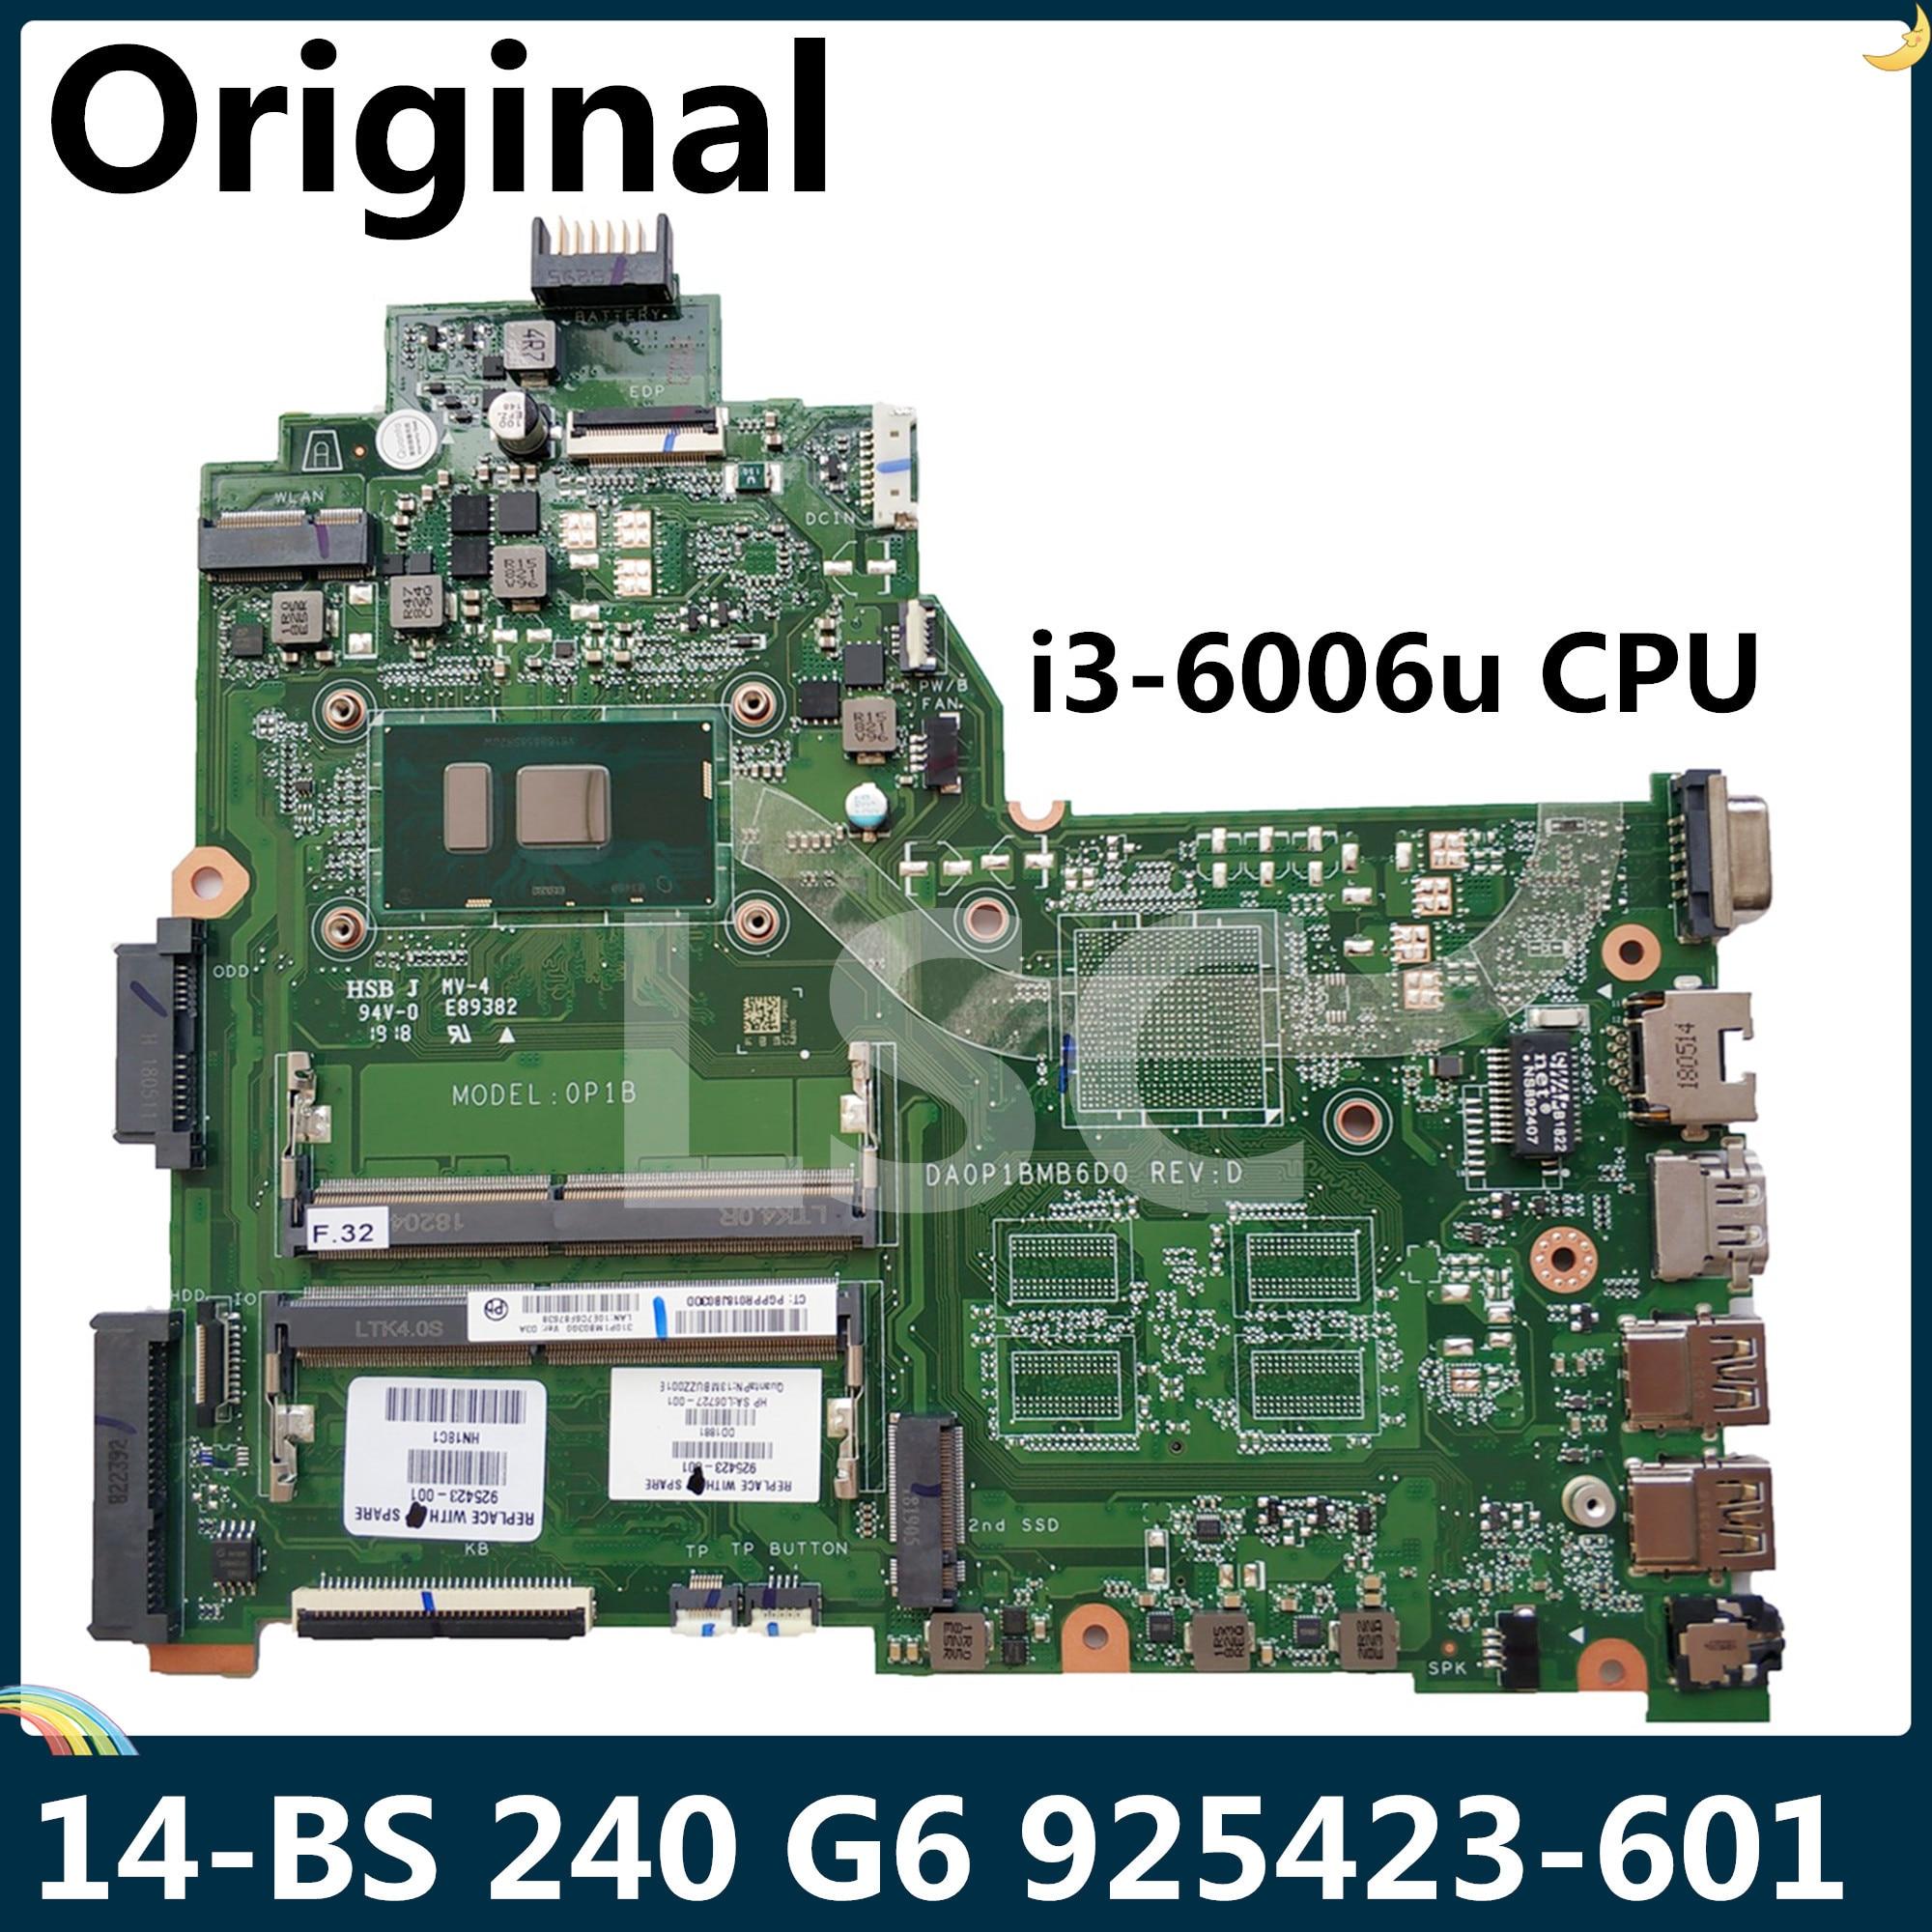 LSC Para HP 14-BS 240 G6 Series Laptop Motherboard 925423-925423-501 925423-601 DA0P1BMB6D0 001 i3-6006u CPU